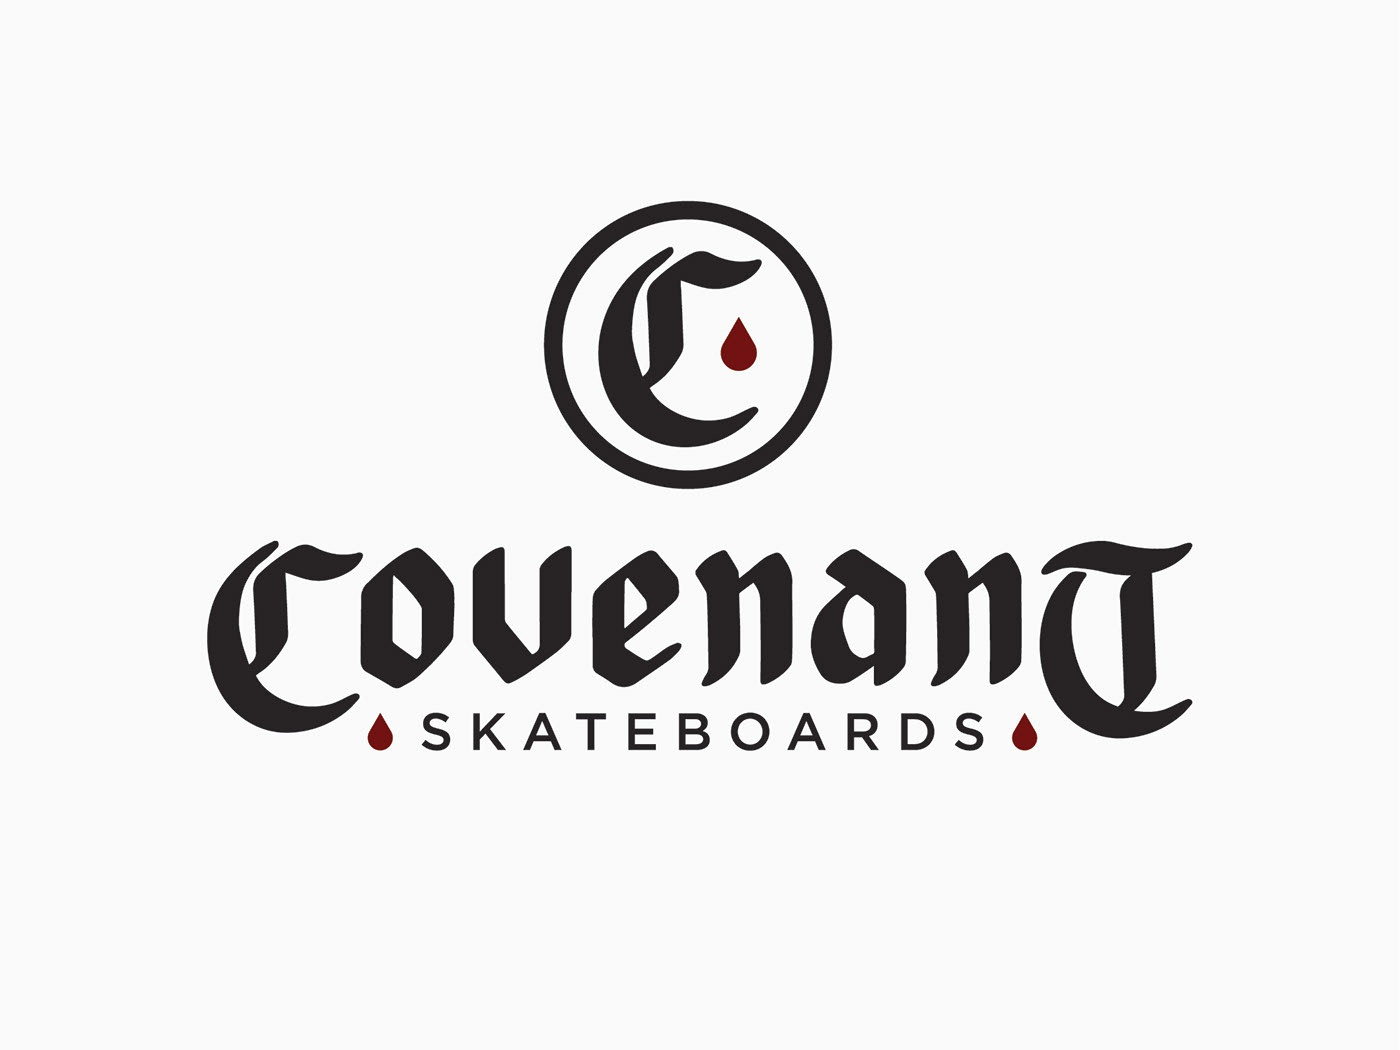 Covenant Skateboards identity type typography vector minimal logo illustration icon design branding